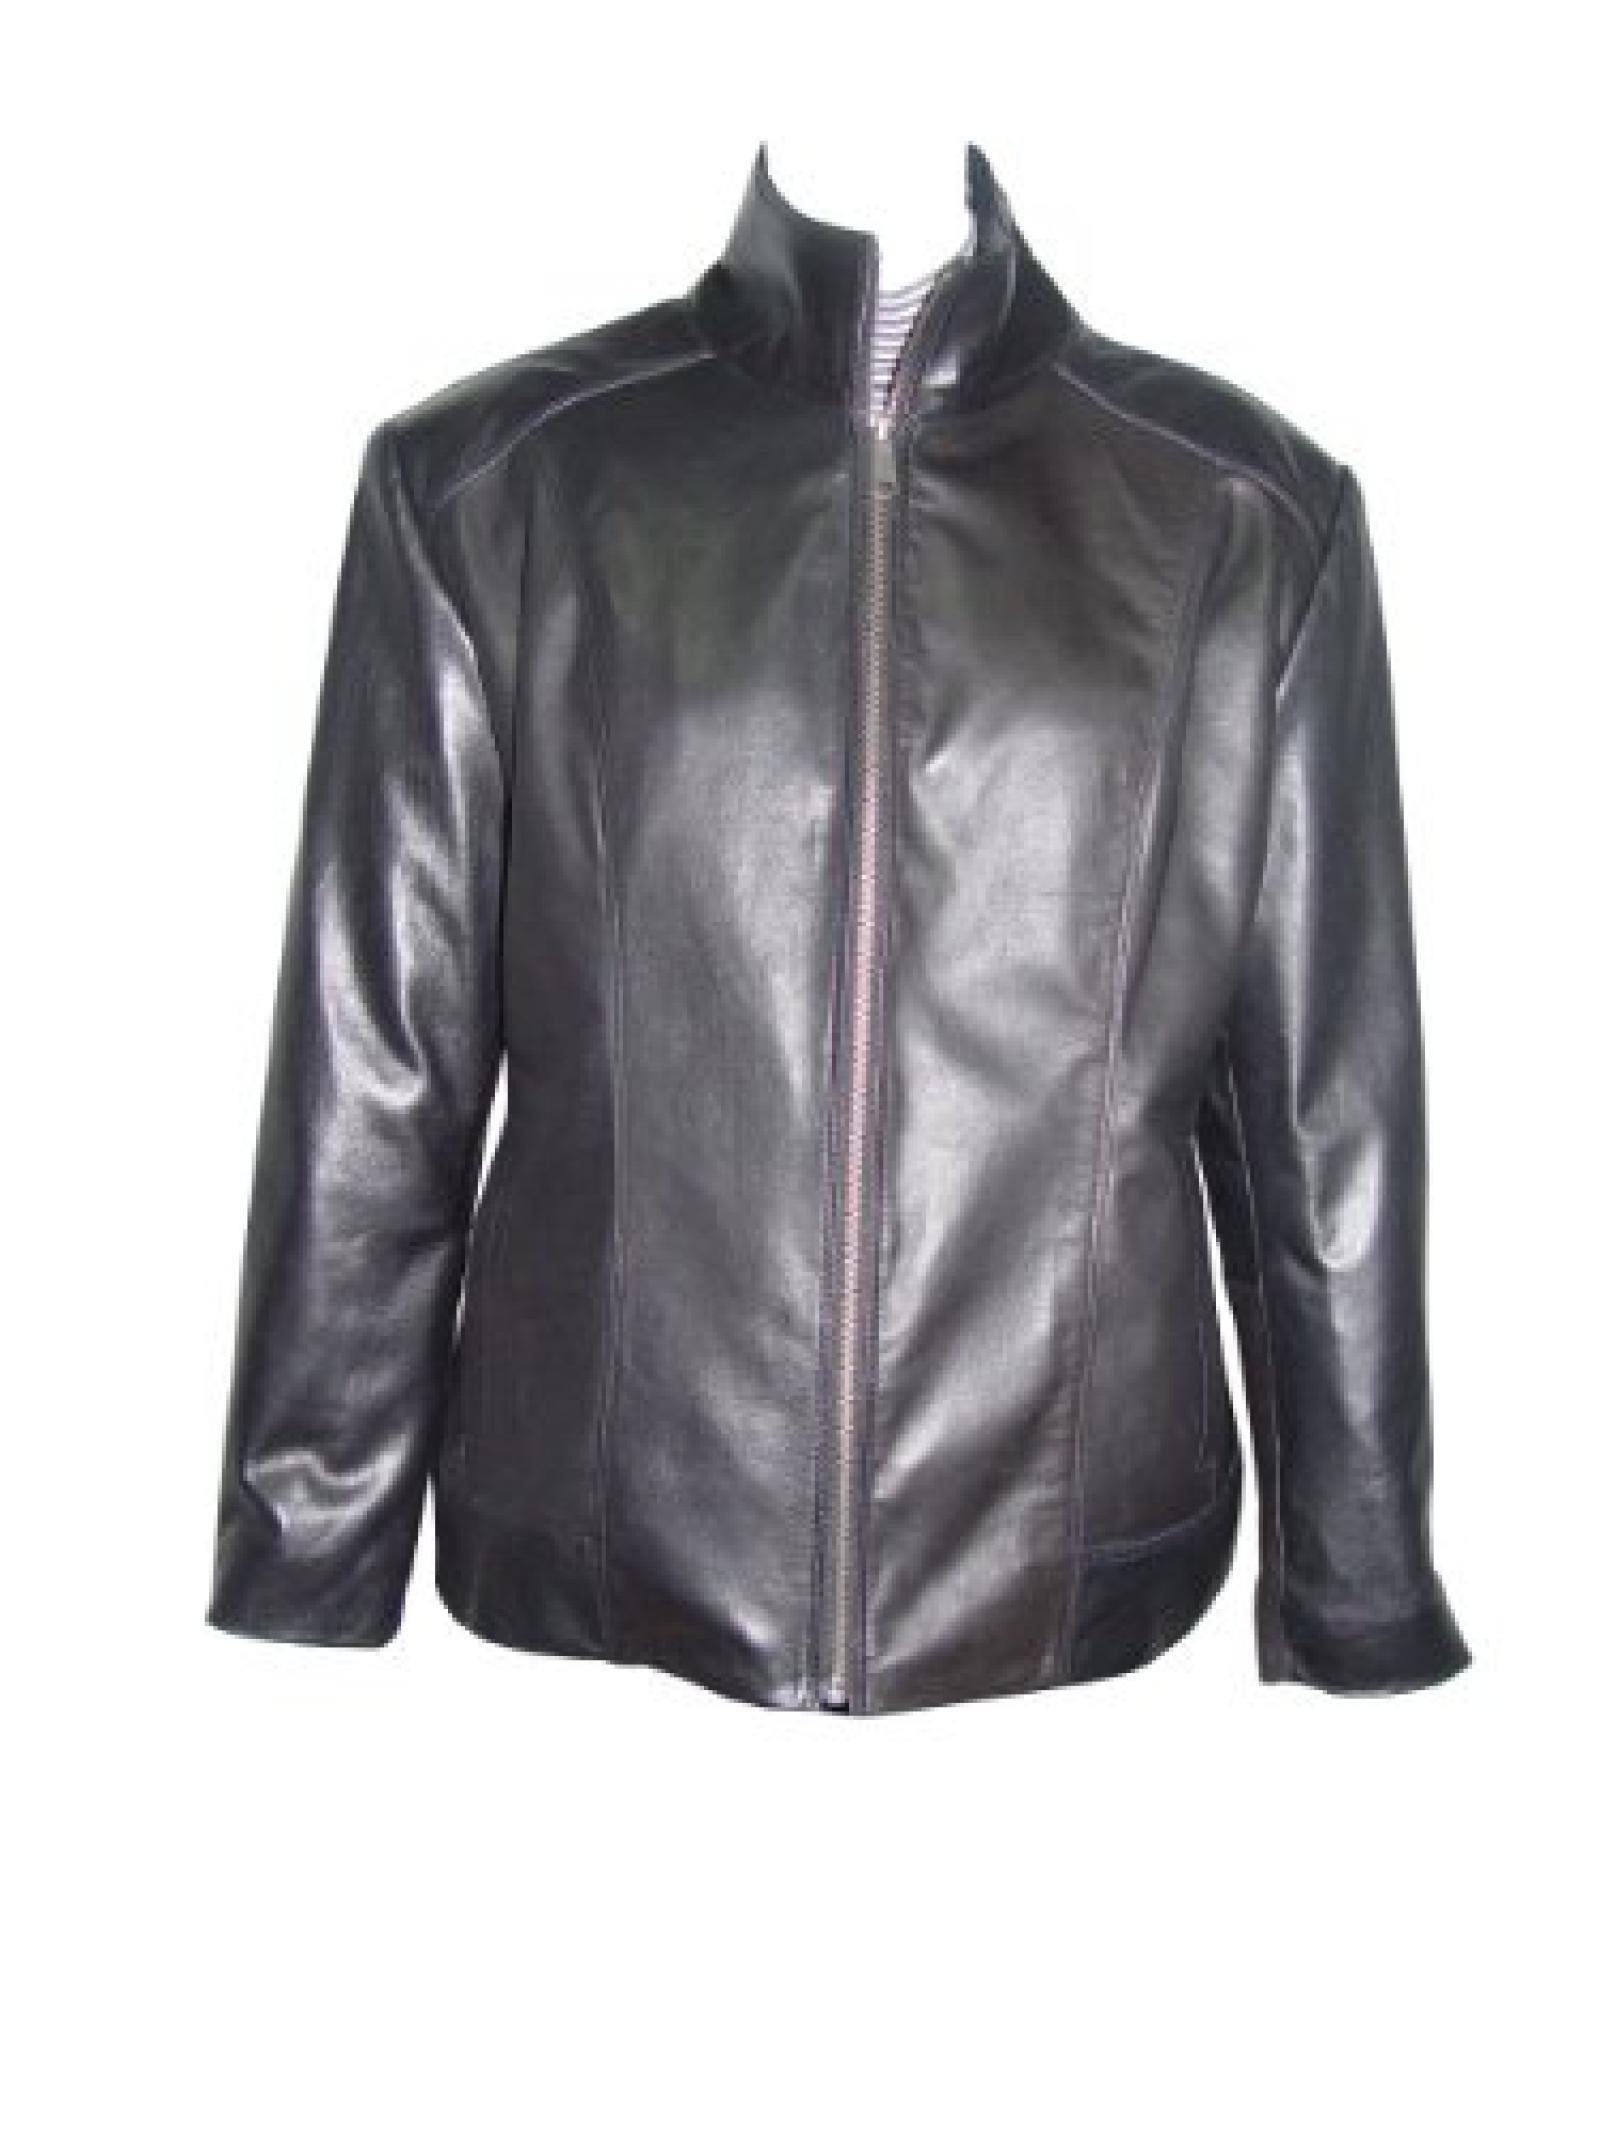 Nettailor Women 4198 Soft Leather New Casual Biker Jacket Zip Front China Collar